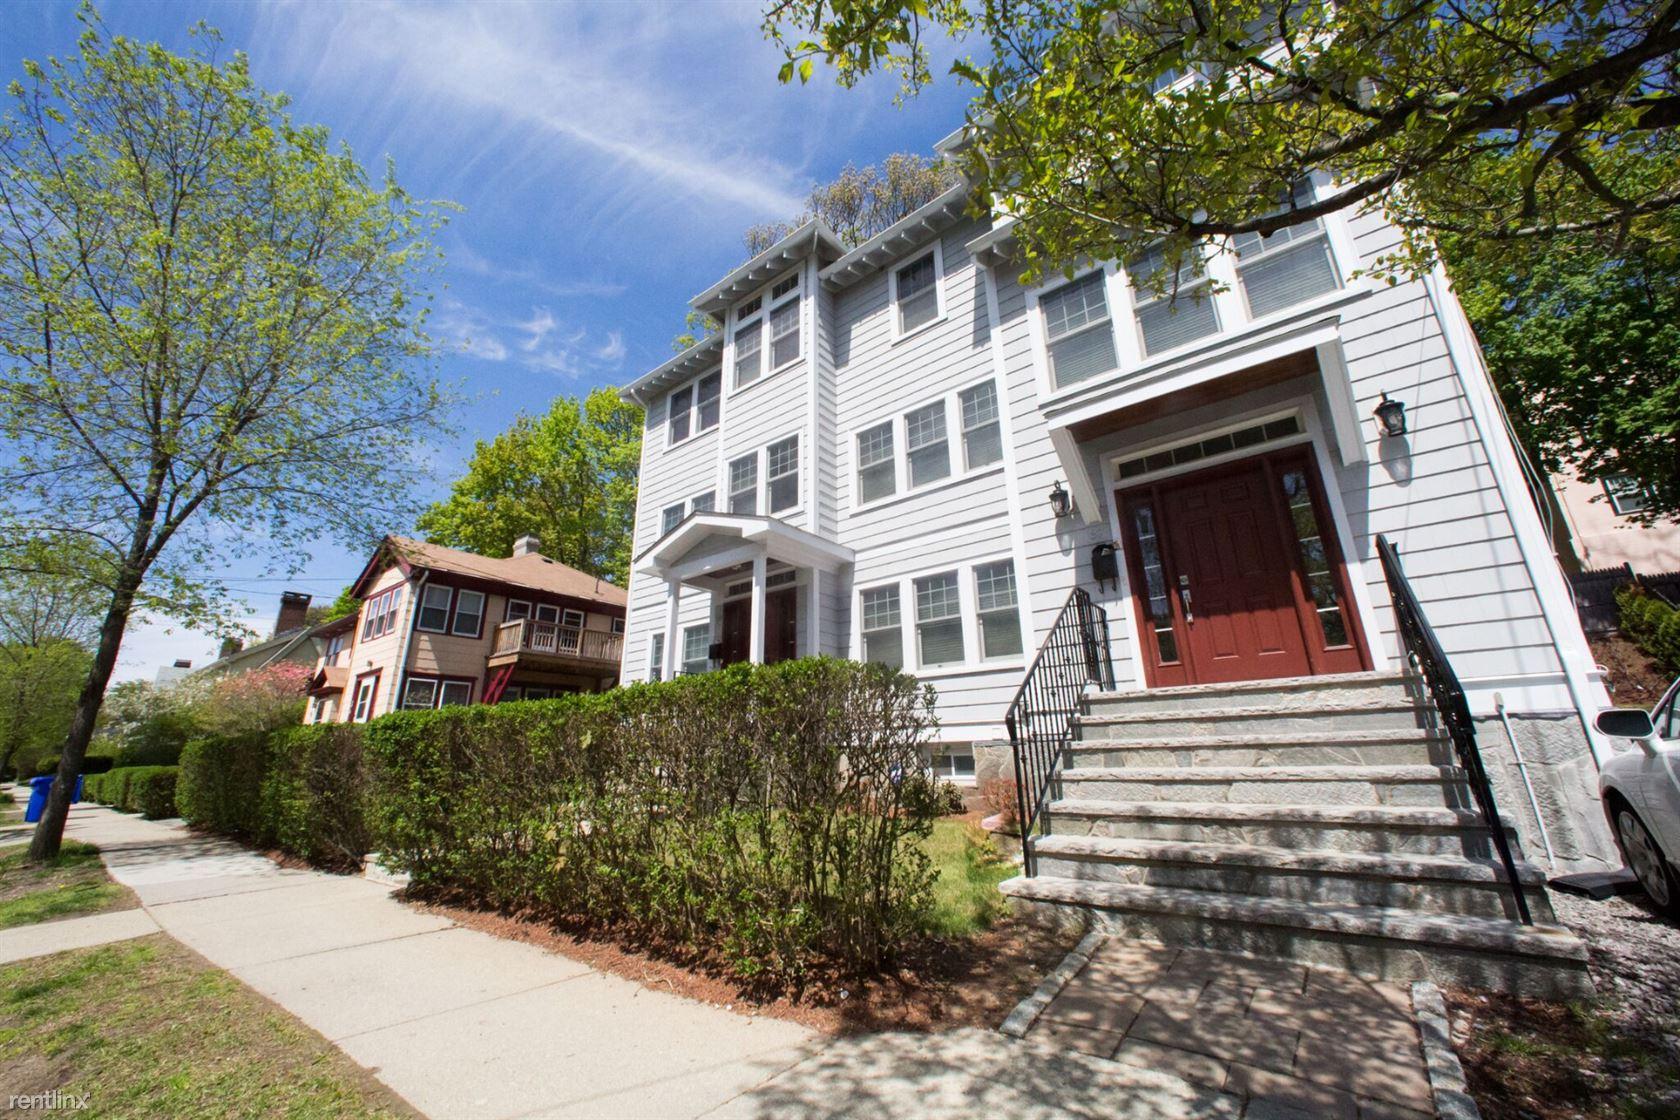 39 Beaconsfield Rd, Brookline, MA - $6,900